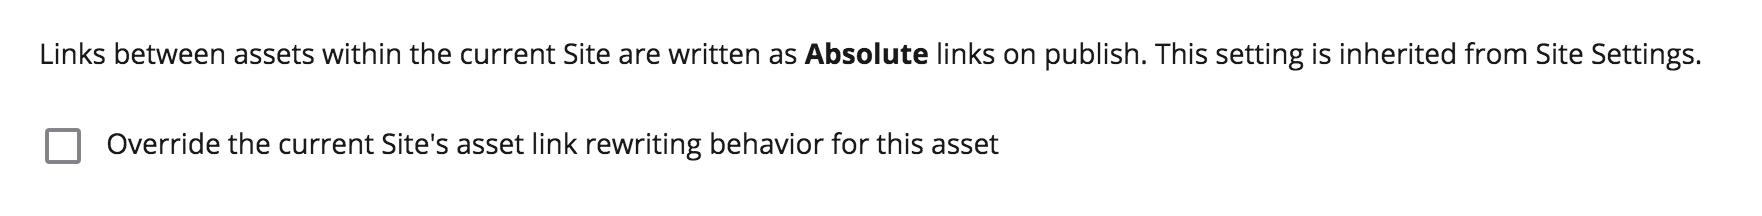 asset level link rewriting options